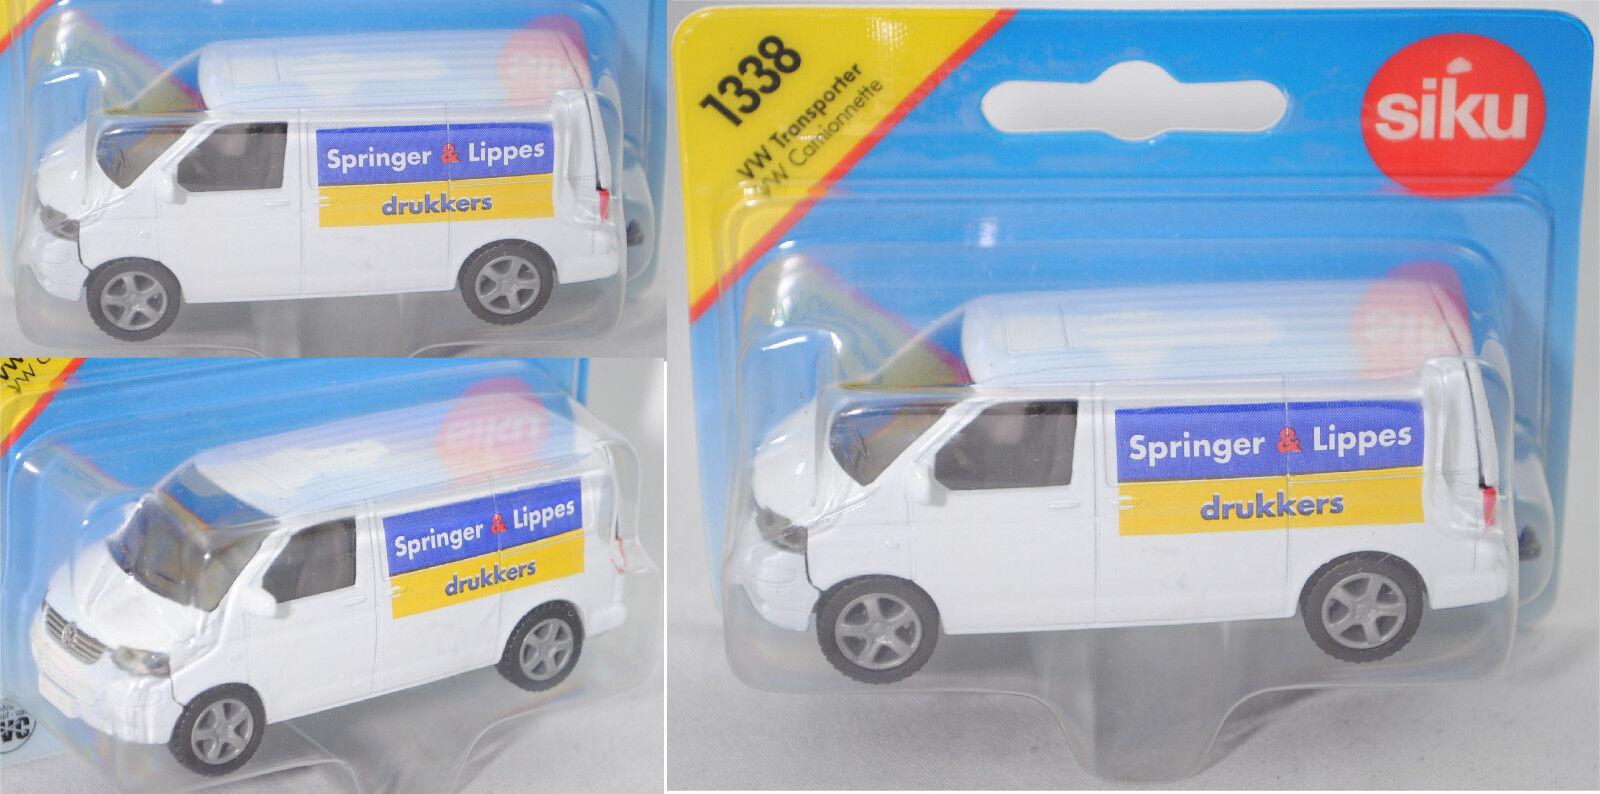 Siku Super 1338 00423 VW t5 t5 t5 Transporter Springer & Lippes drukkers, colección d38e8b